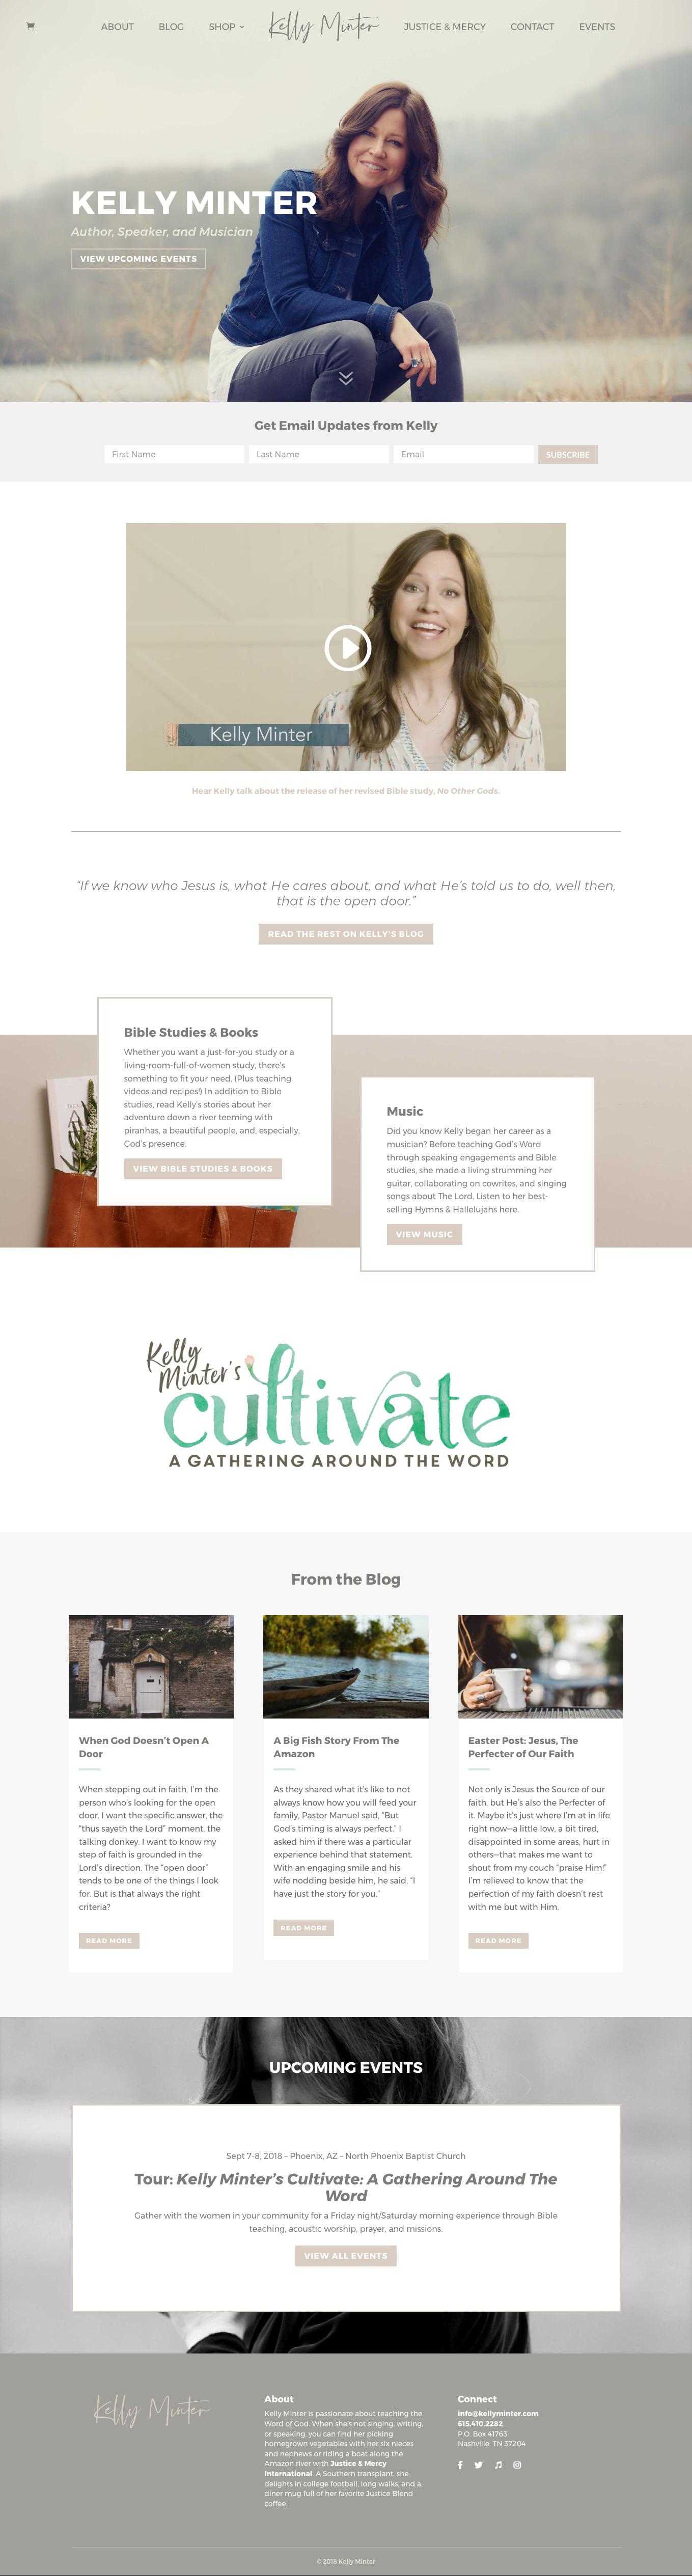 Kelly Minter Updated Website